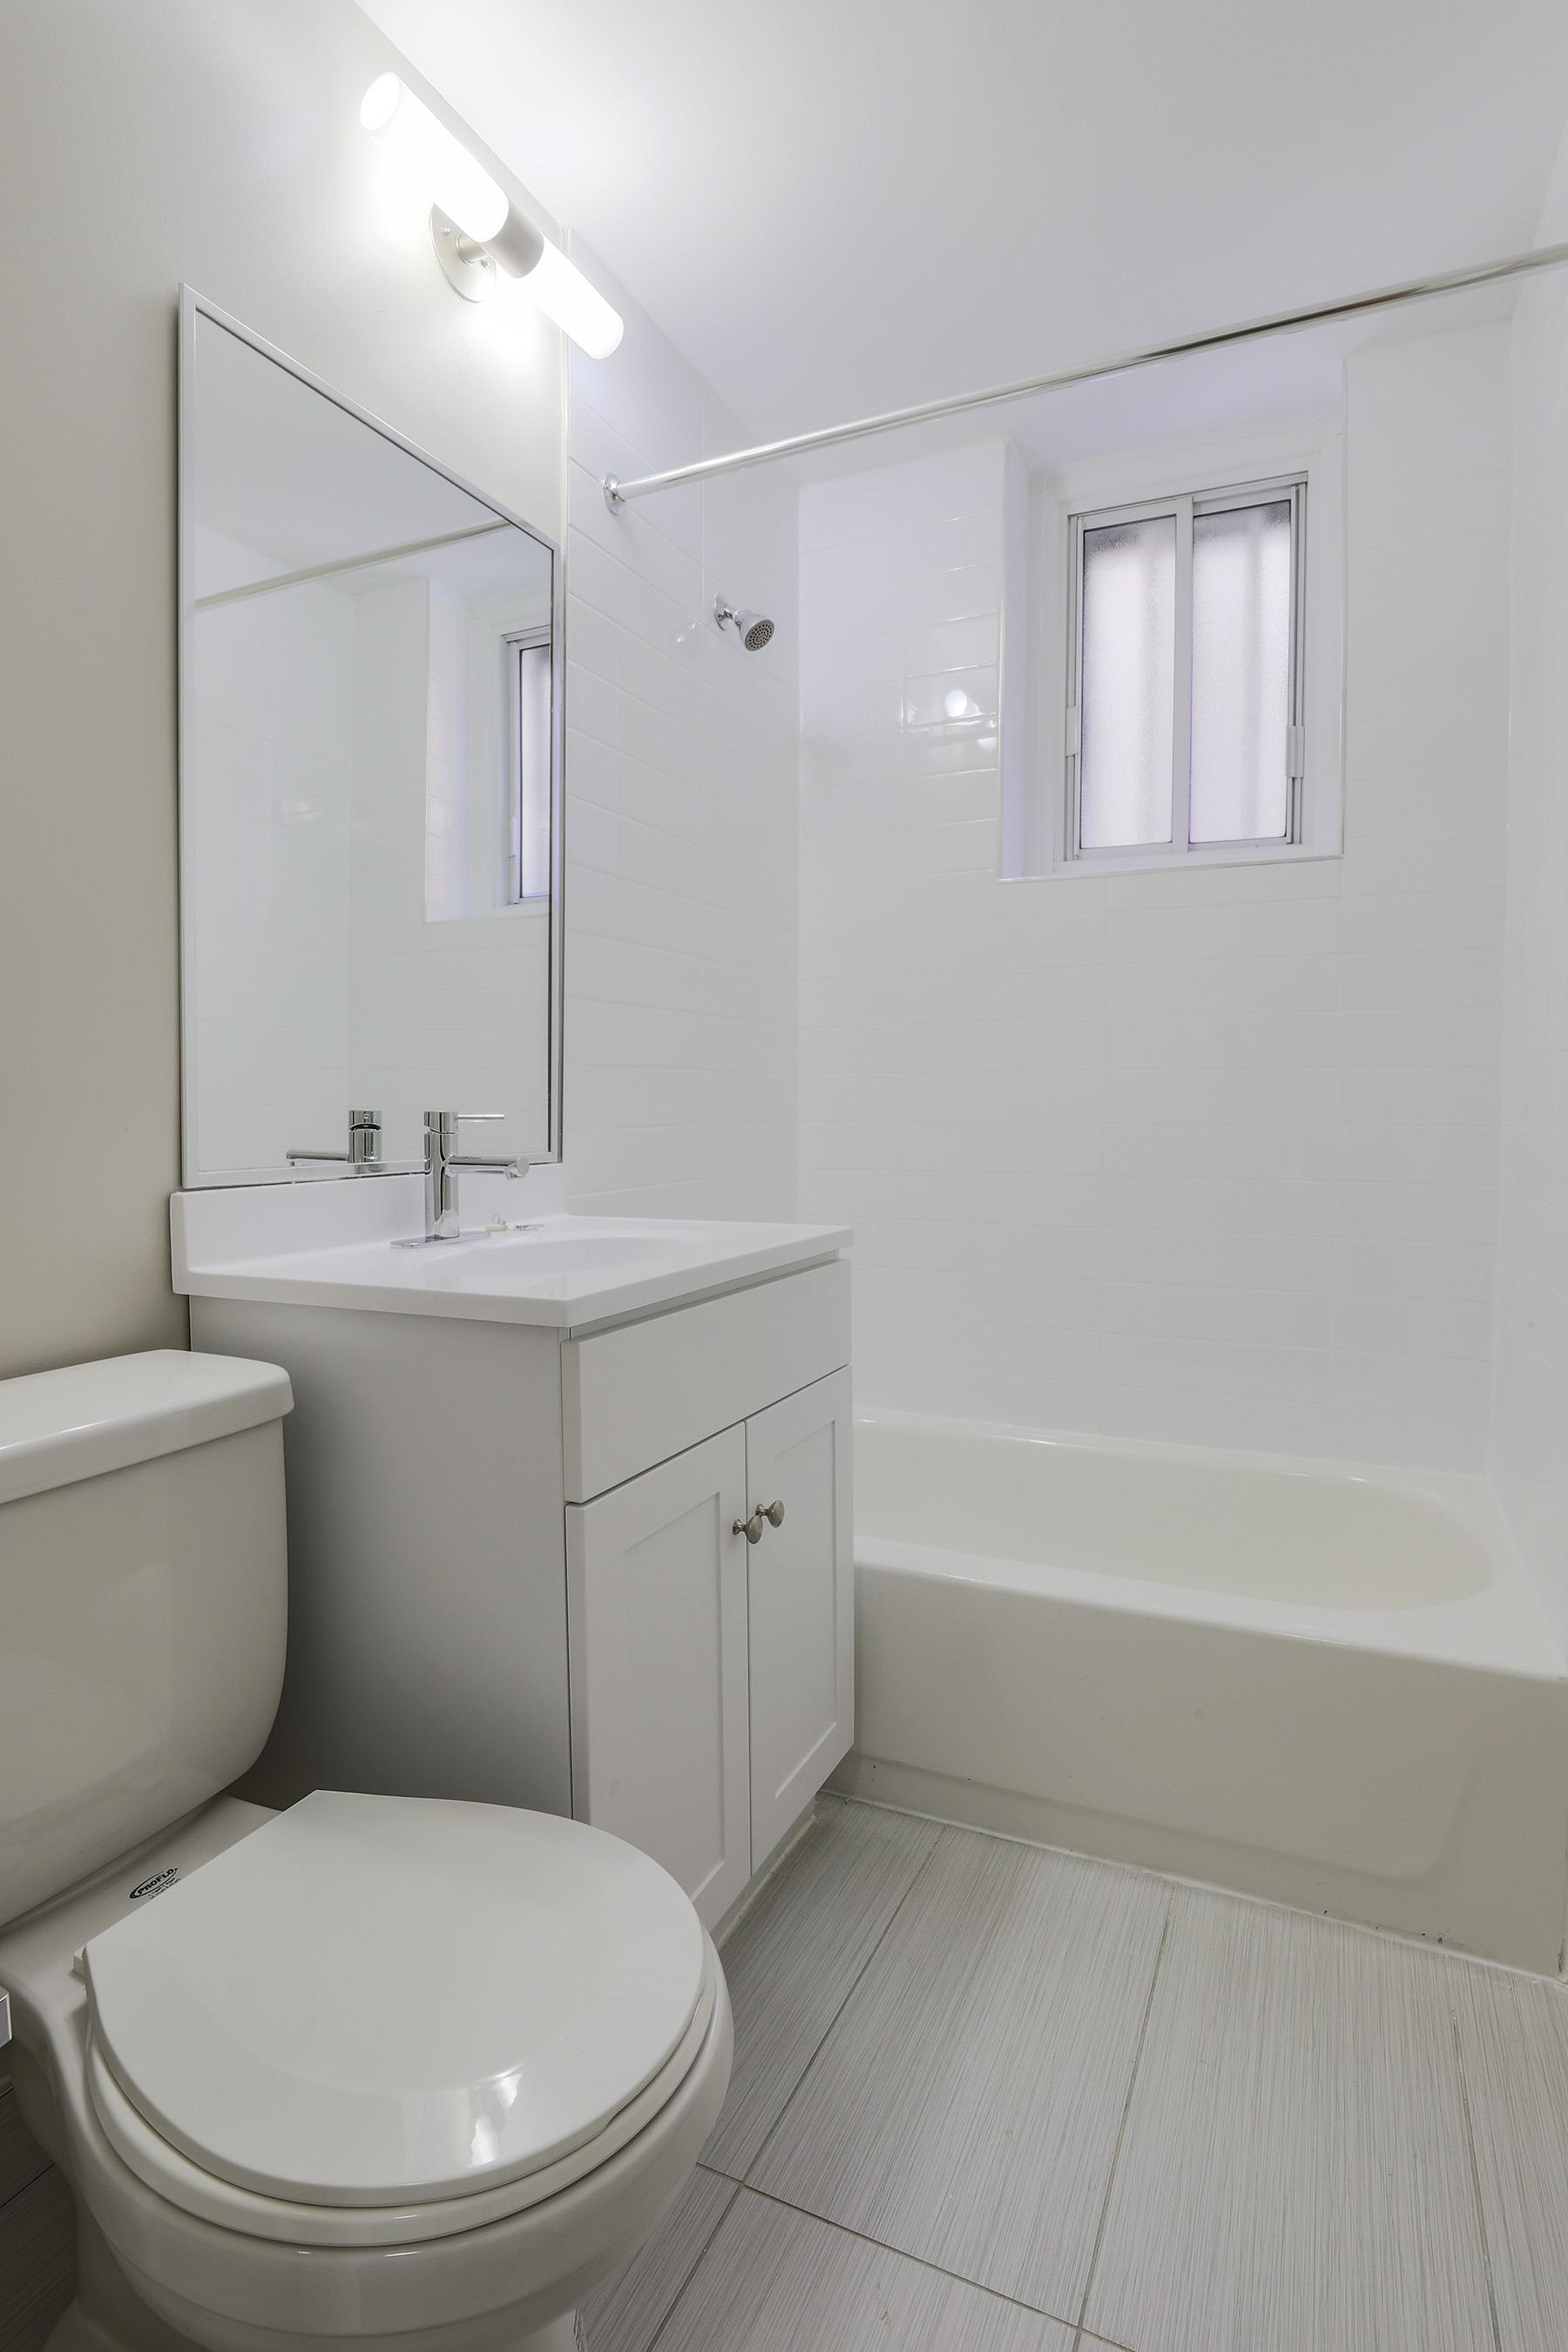 1 bedroom Apartments for rent in Cote-St-Luc at Les immeubles MacDonald - Photo 07 - RentQuebecApartments – L401535